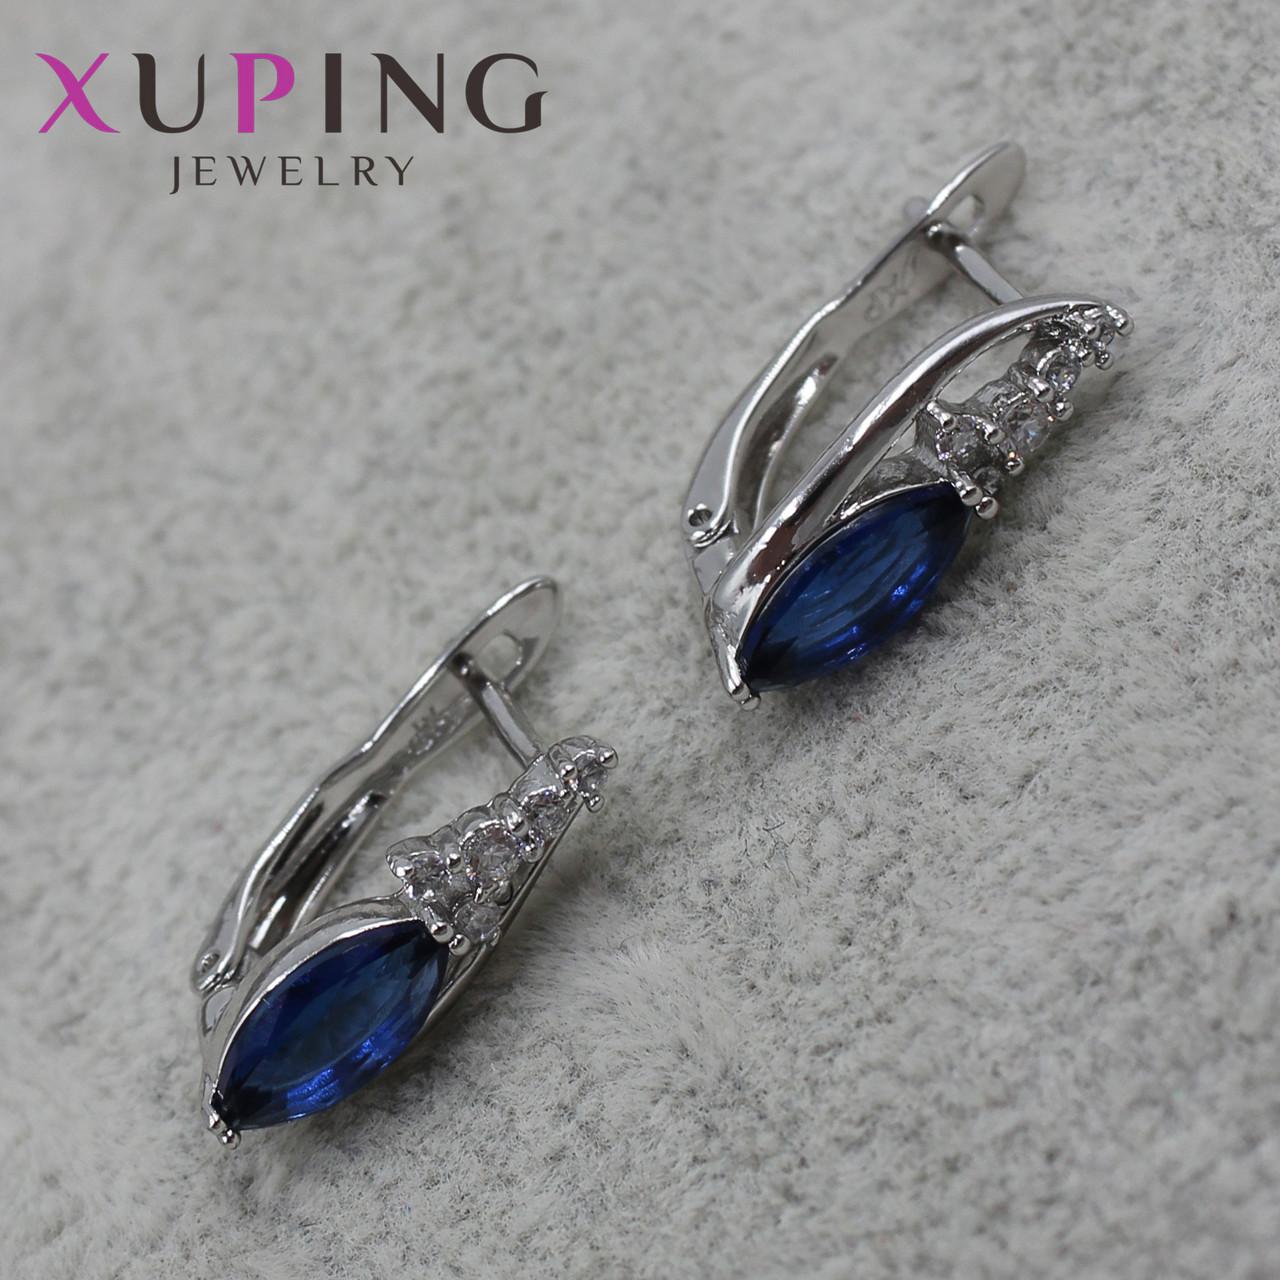 Серьги женские Xuping Jewelry медицинское золото - 1110721685